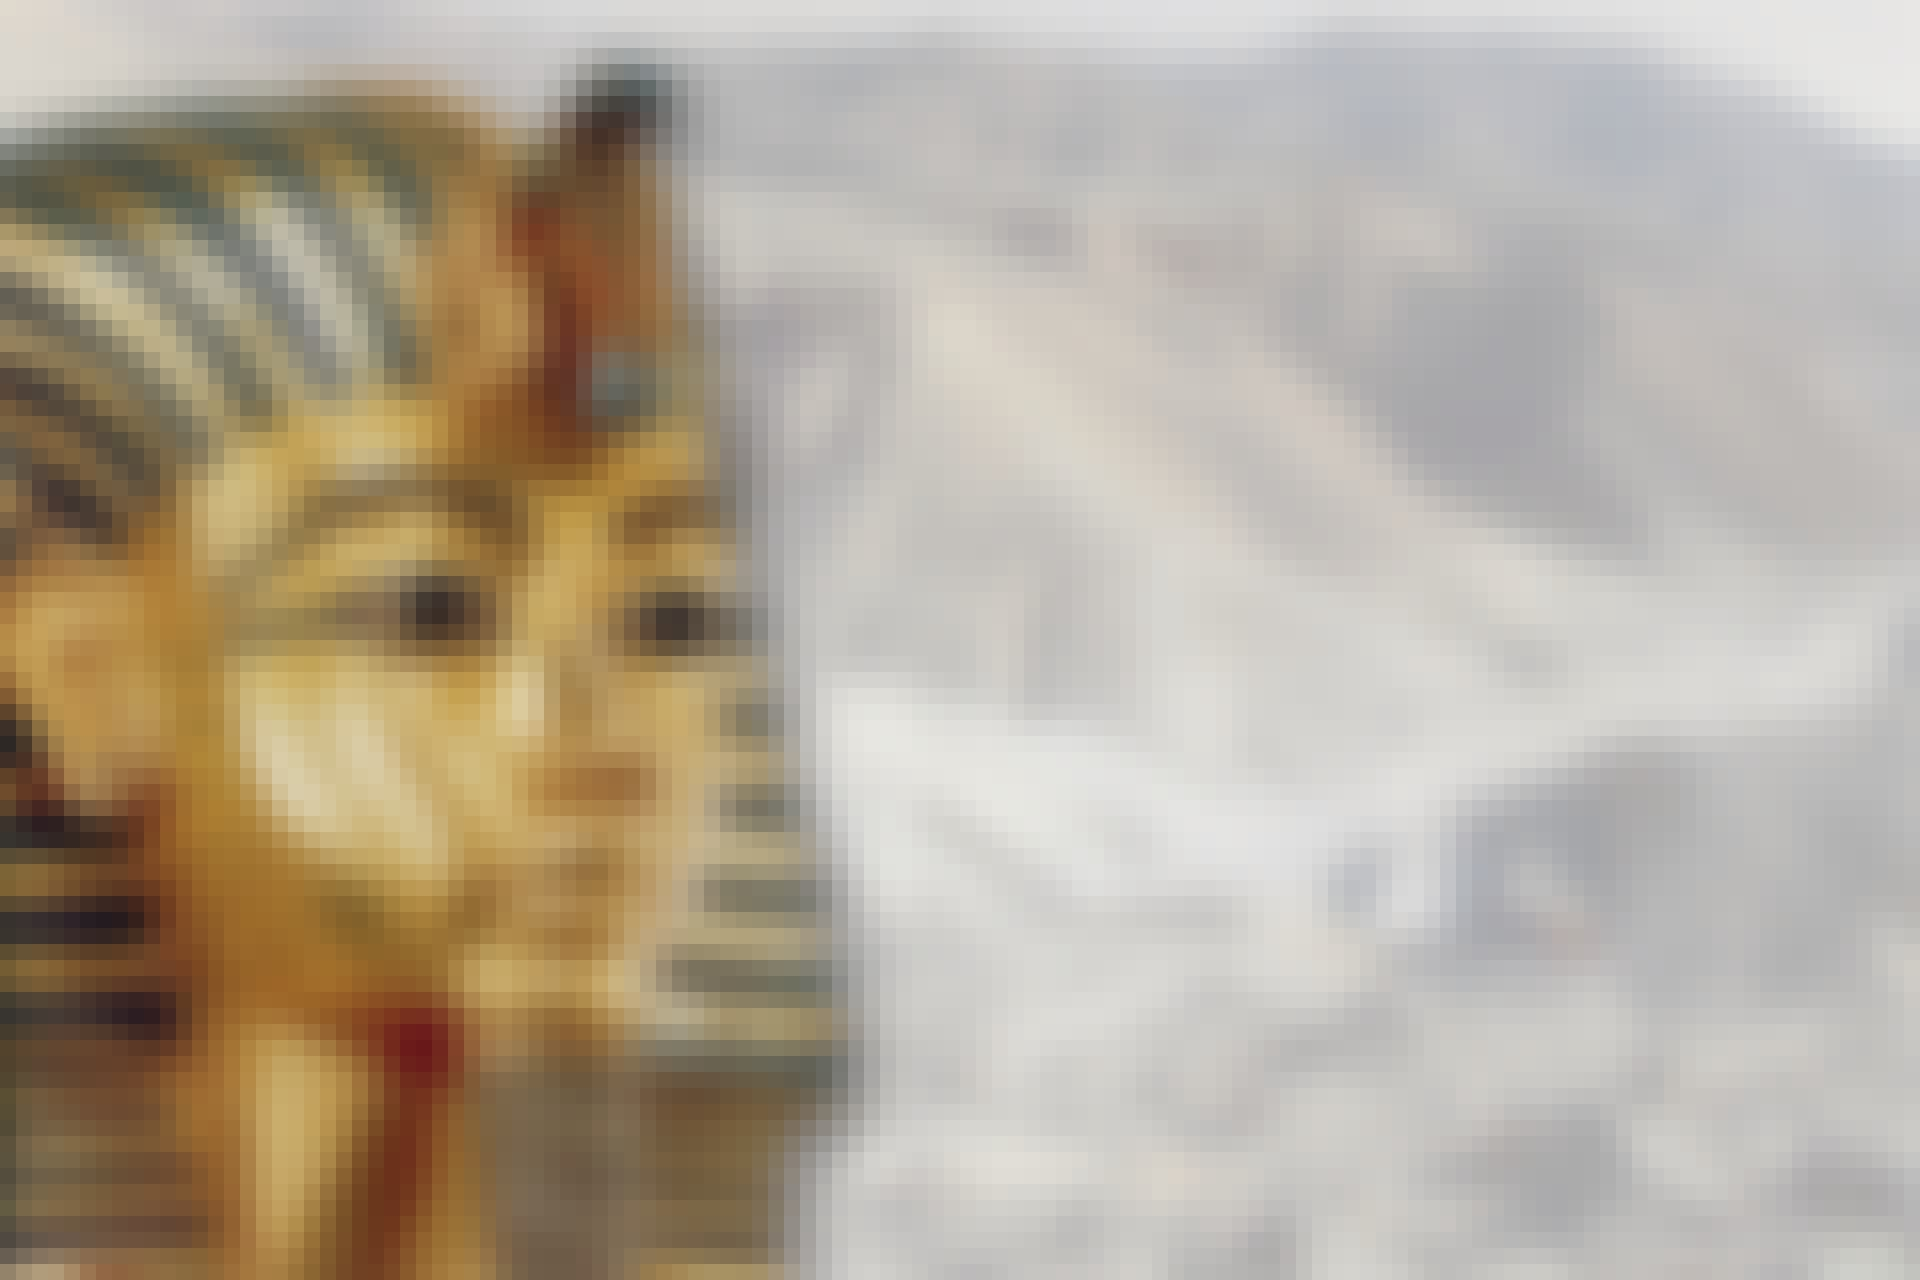 Den guldmask farao Tutankhamun begravdes med.